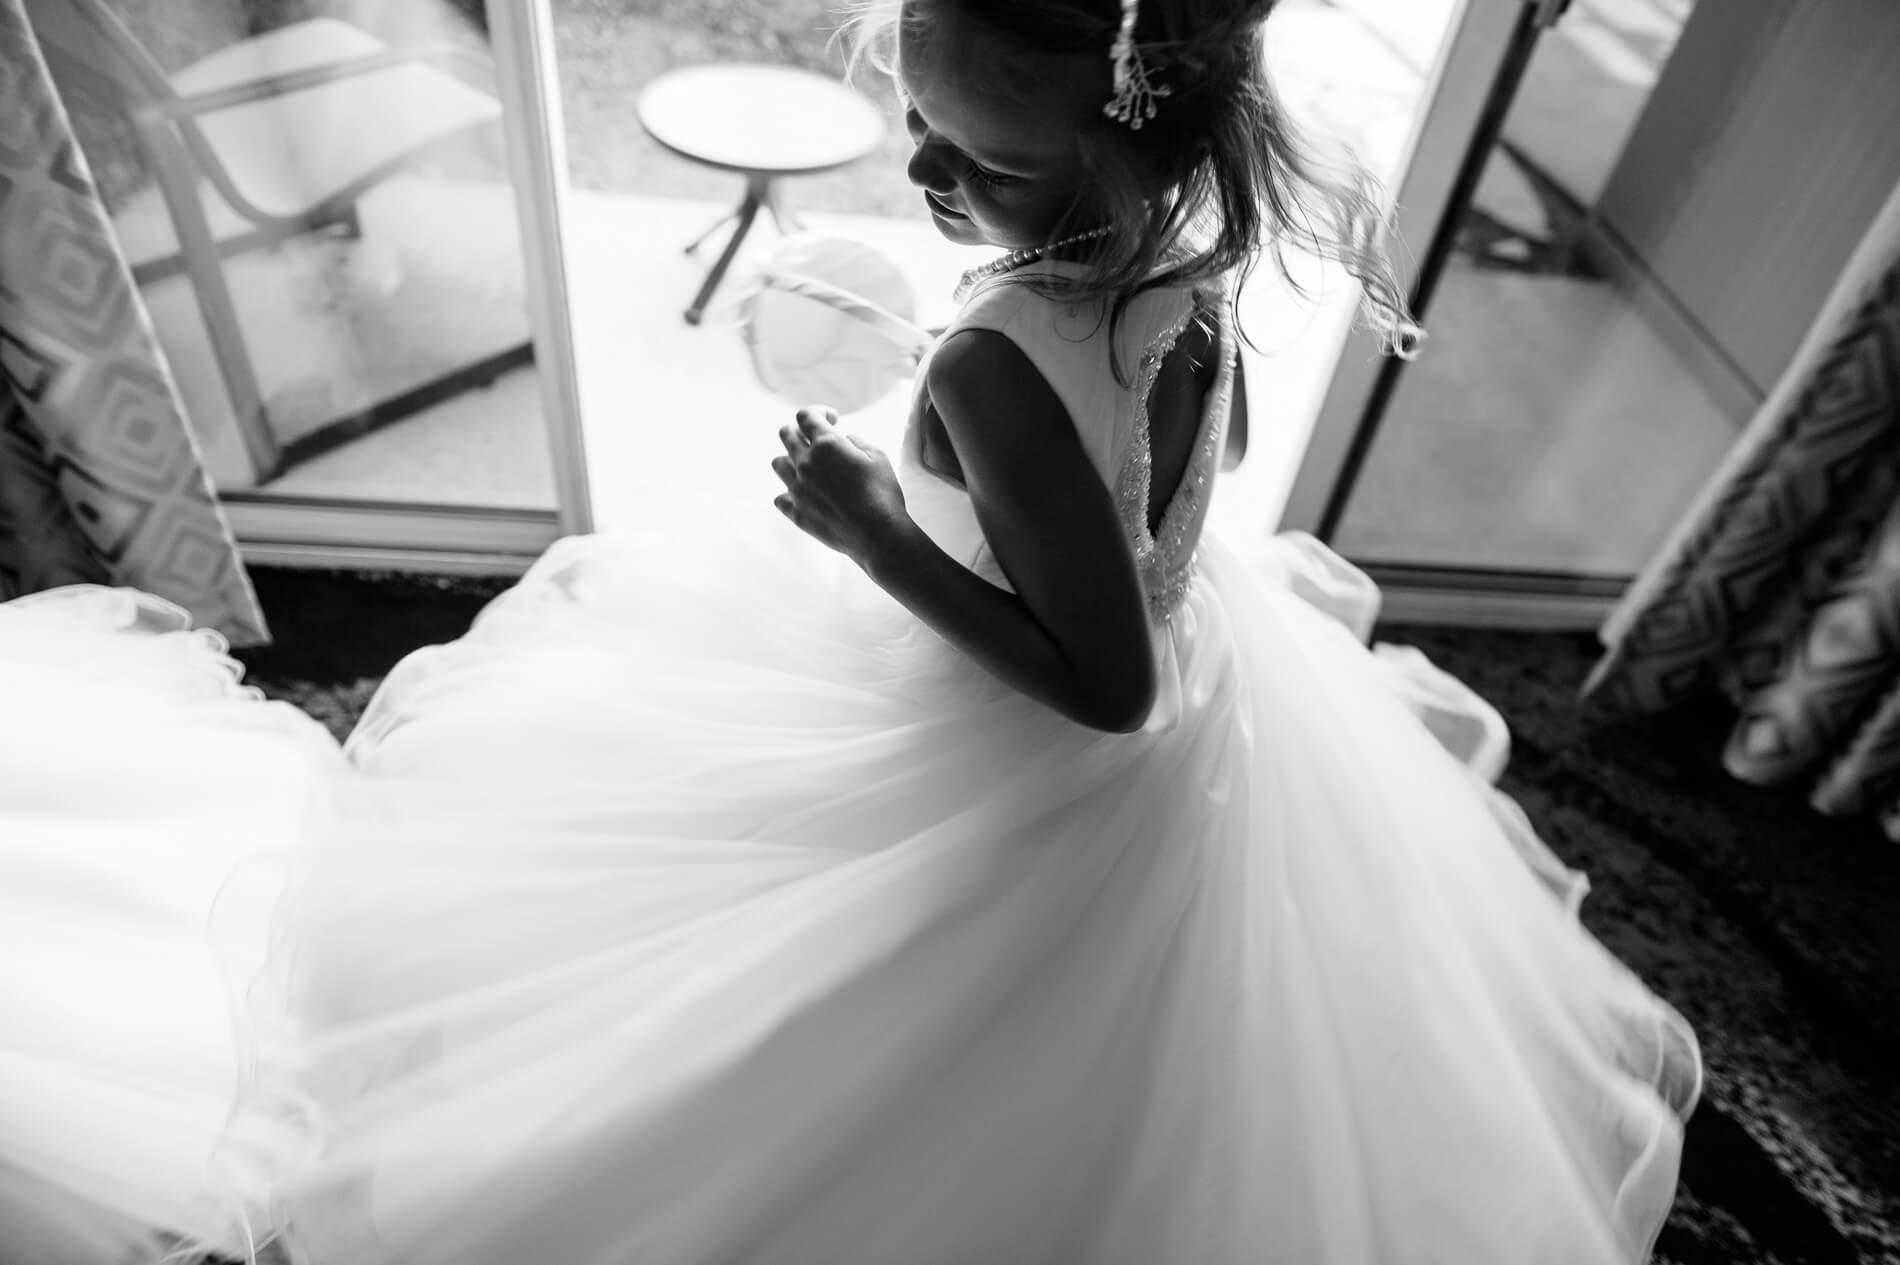 flower girl spins in bridal suite before wedding